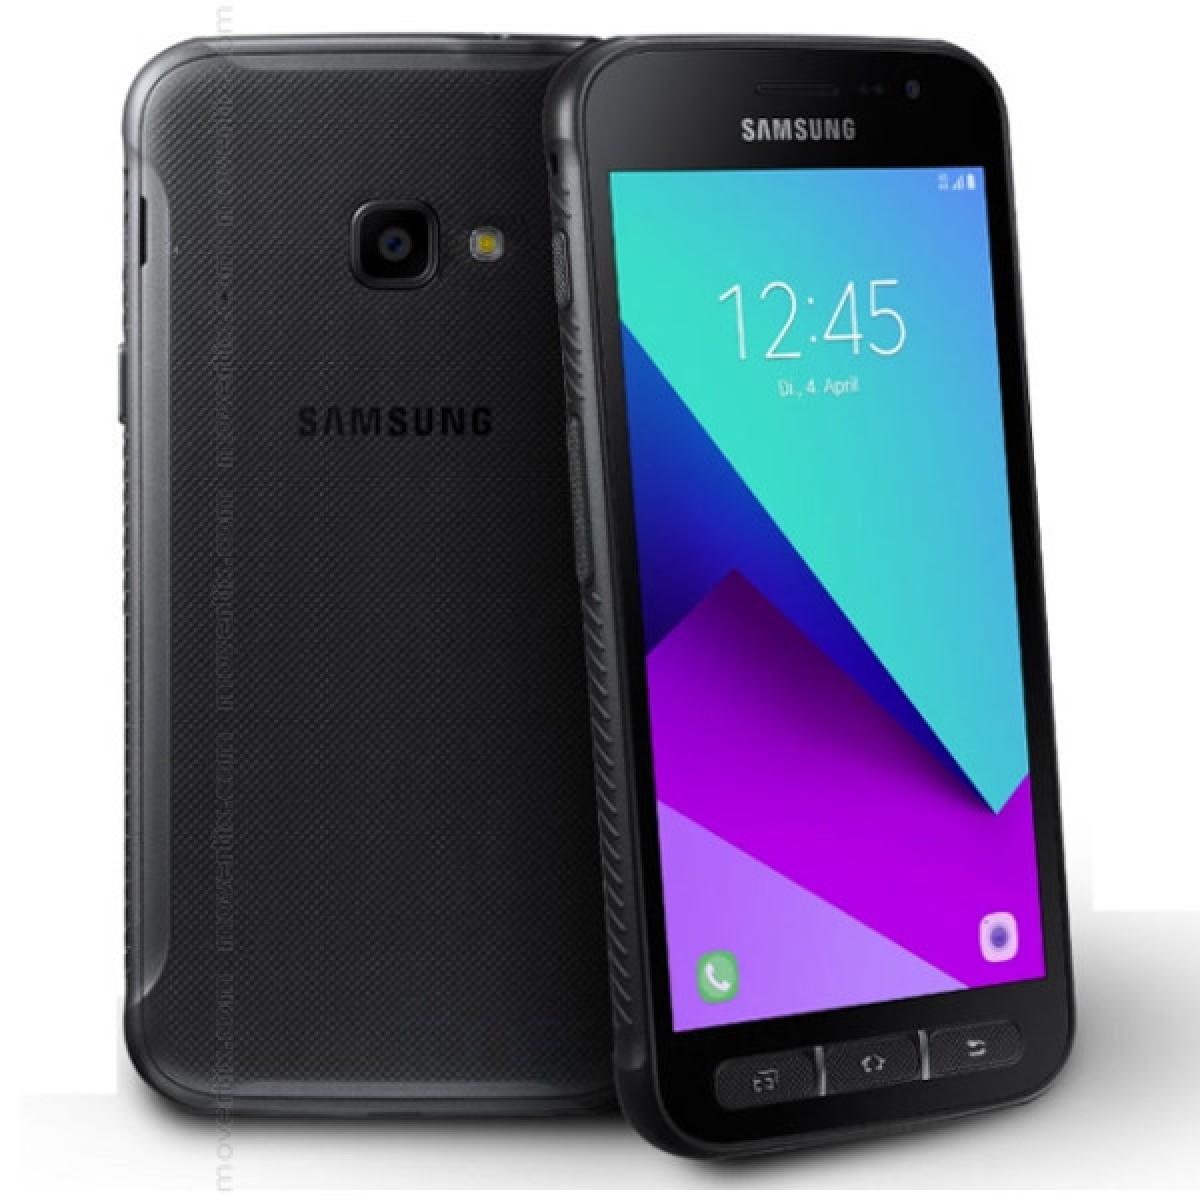 sports shoes b59a8 7a9b2 Samsung Galaxy Xcover 4 Black (G390F)